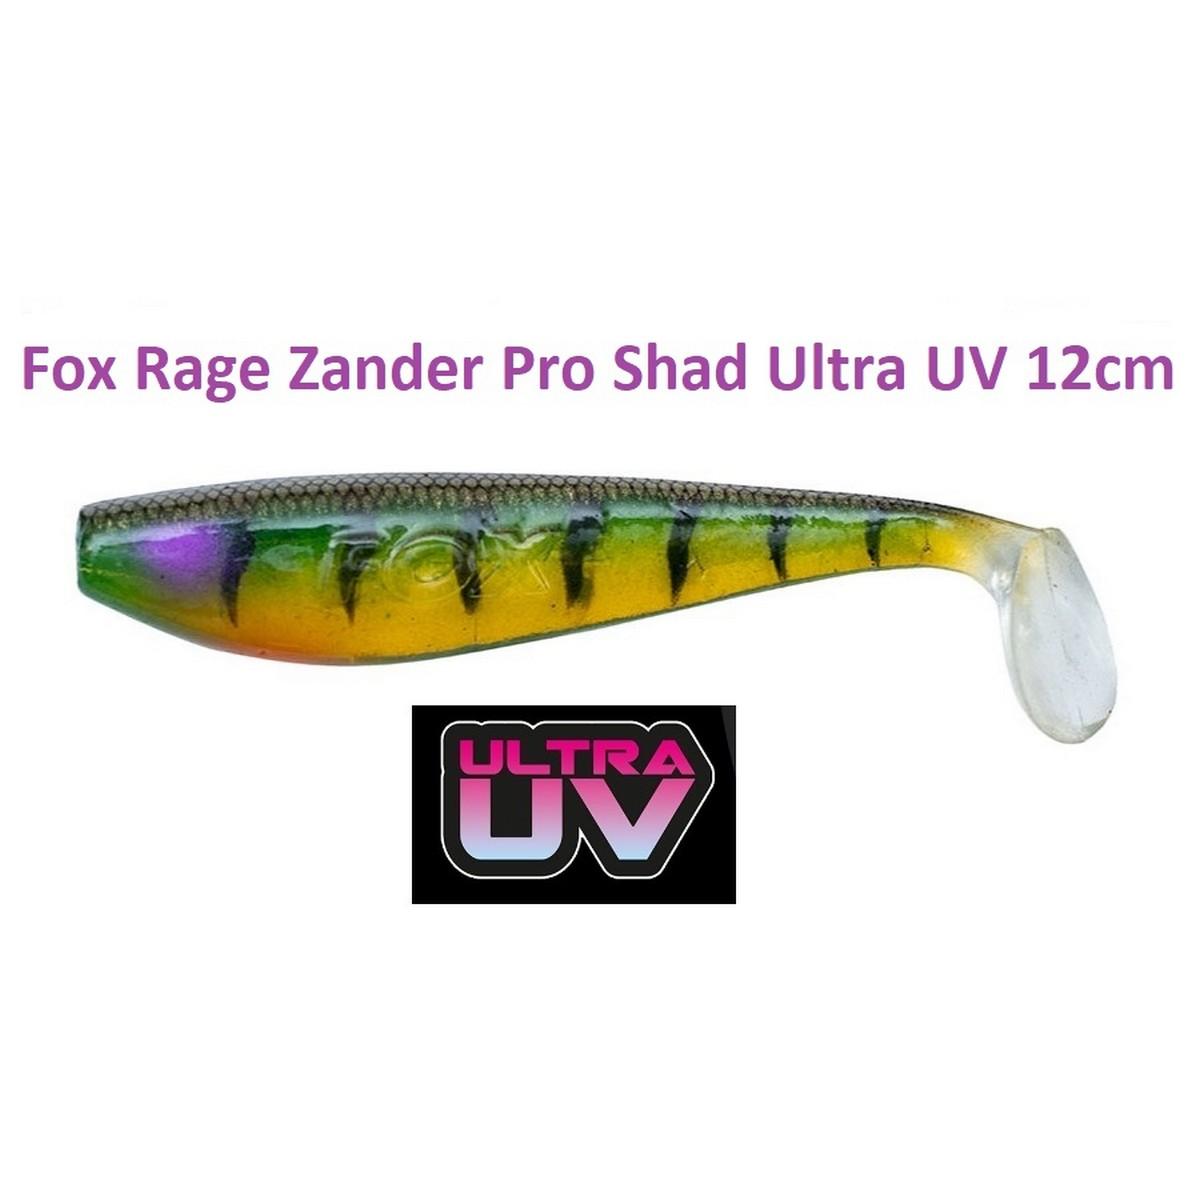 Силиконова примамка Fox Rage Zander Pro Shad Ultra UV 12cm